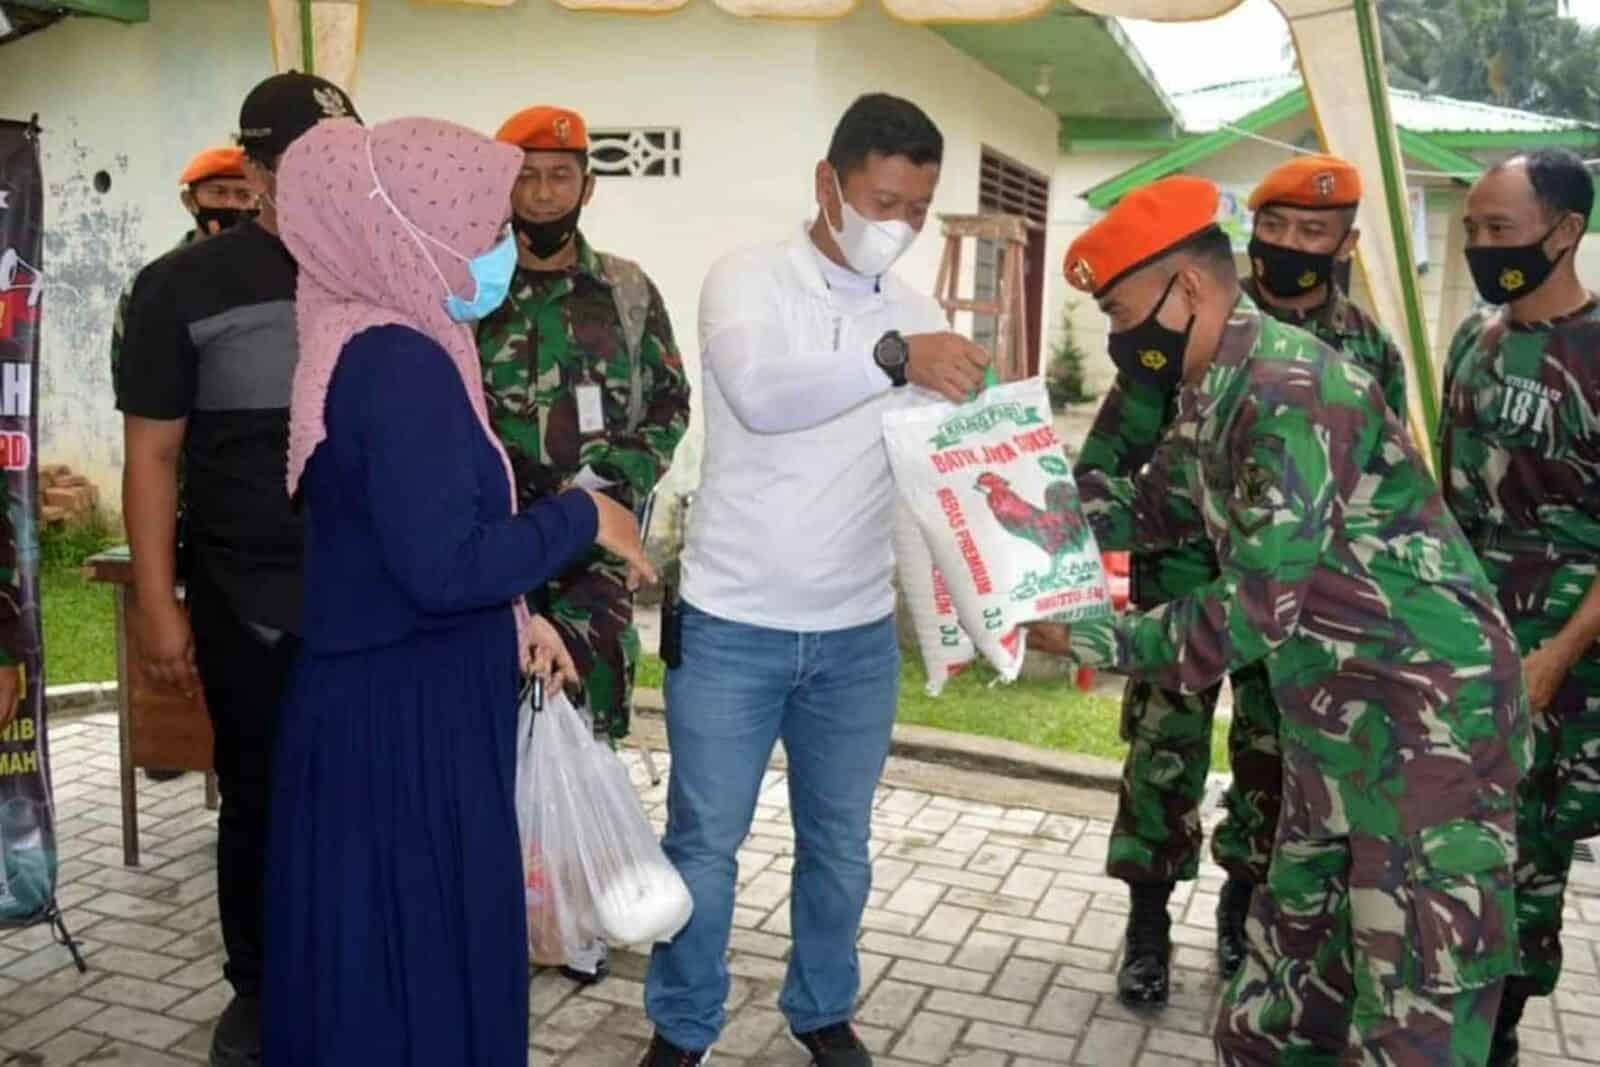 Danwing III Paskhas Kolonel Pas Deni Ramdani, S.E. Membuka Acara Bhakti Sosial Berupa Kegiatan Pasar Murah 5 Titik di Wilayah Kota Medan